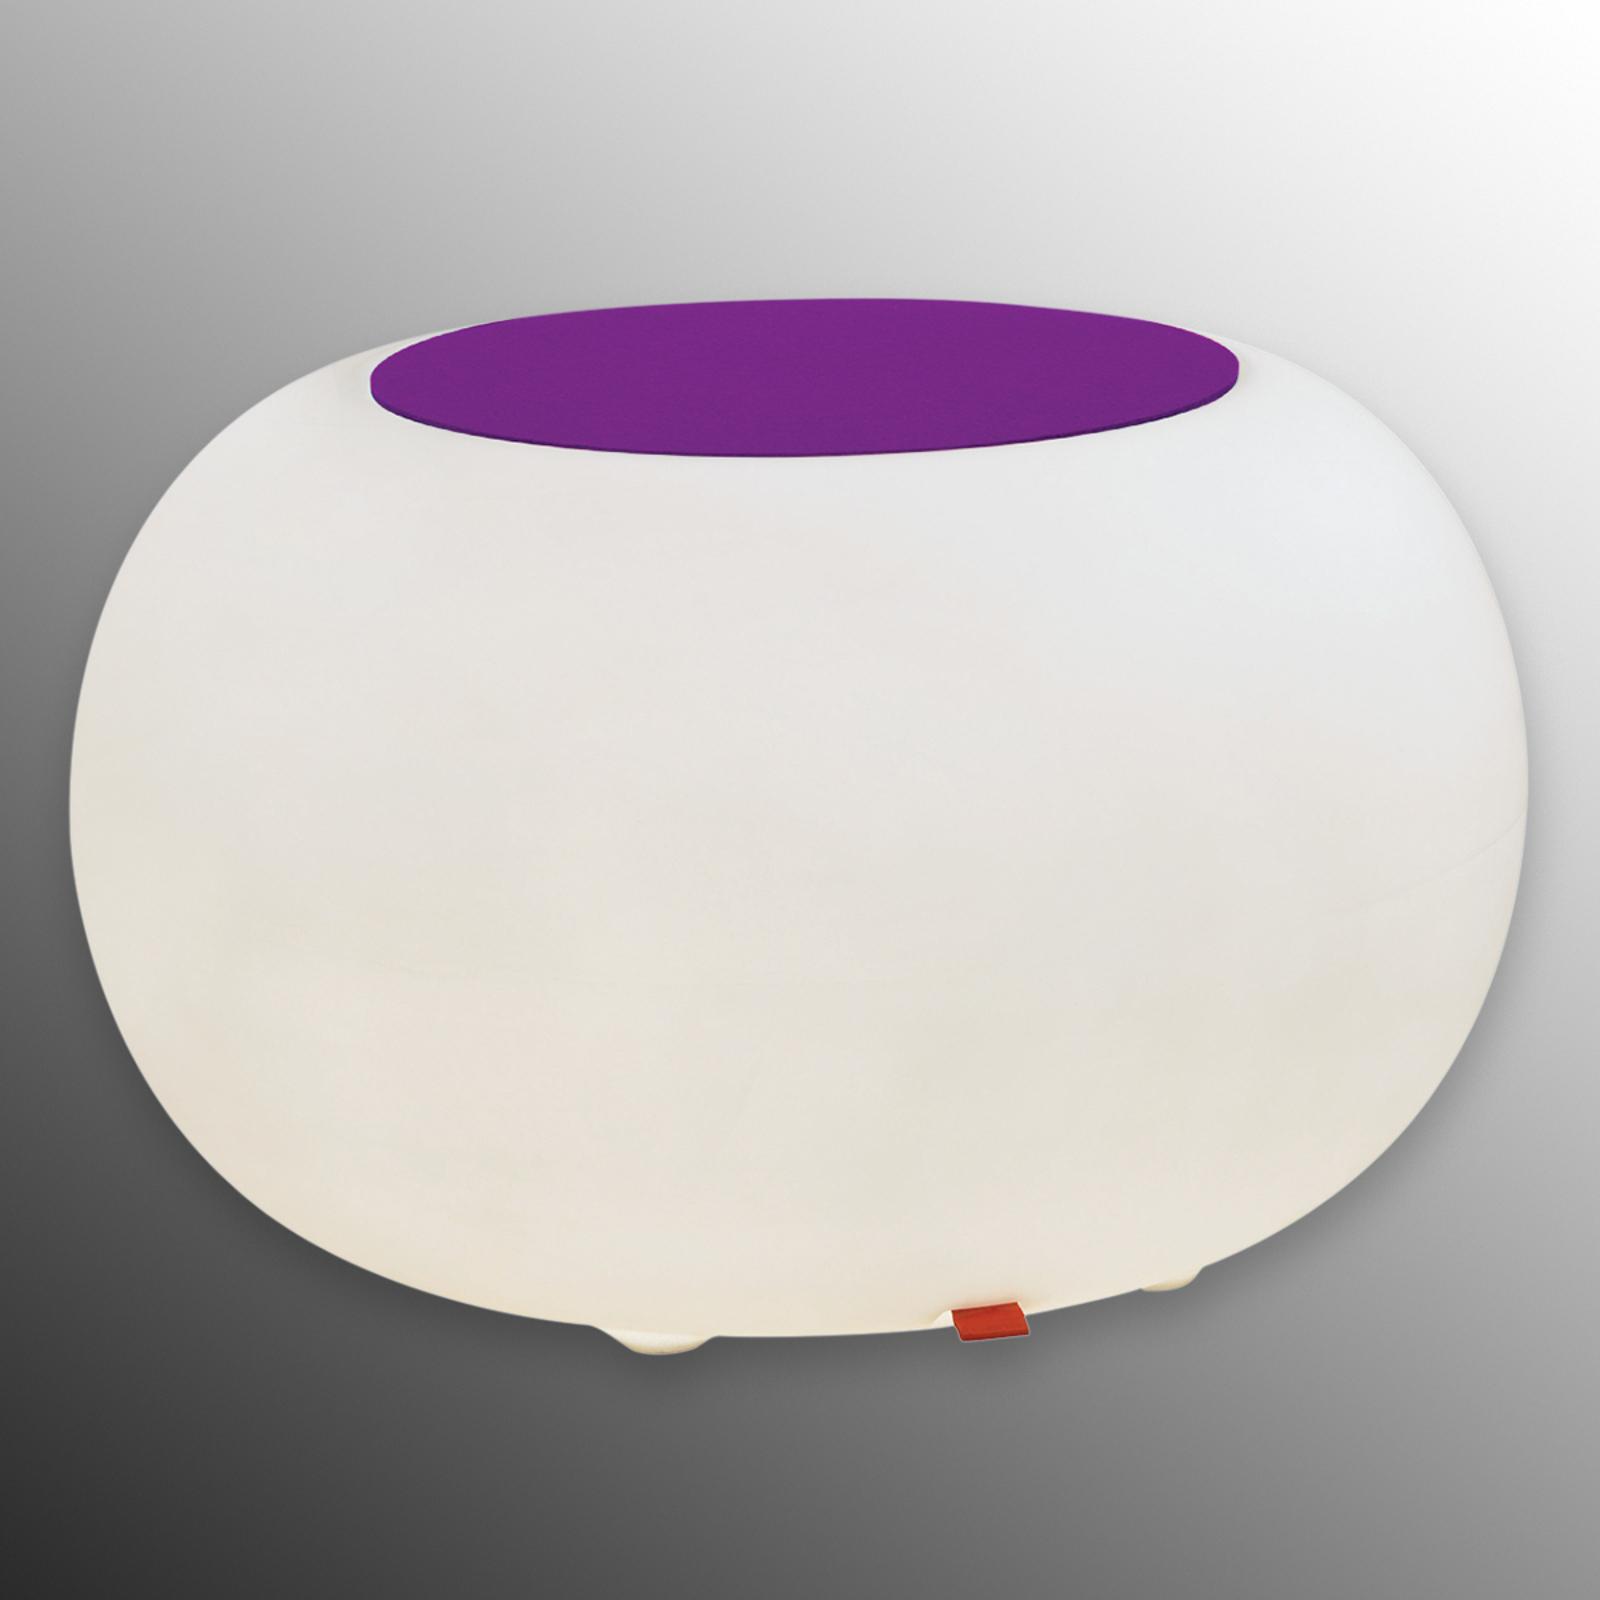 Bubble LED ACCU Outdoor - bord violett filtyta